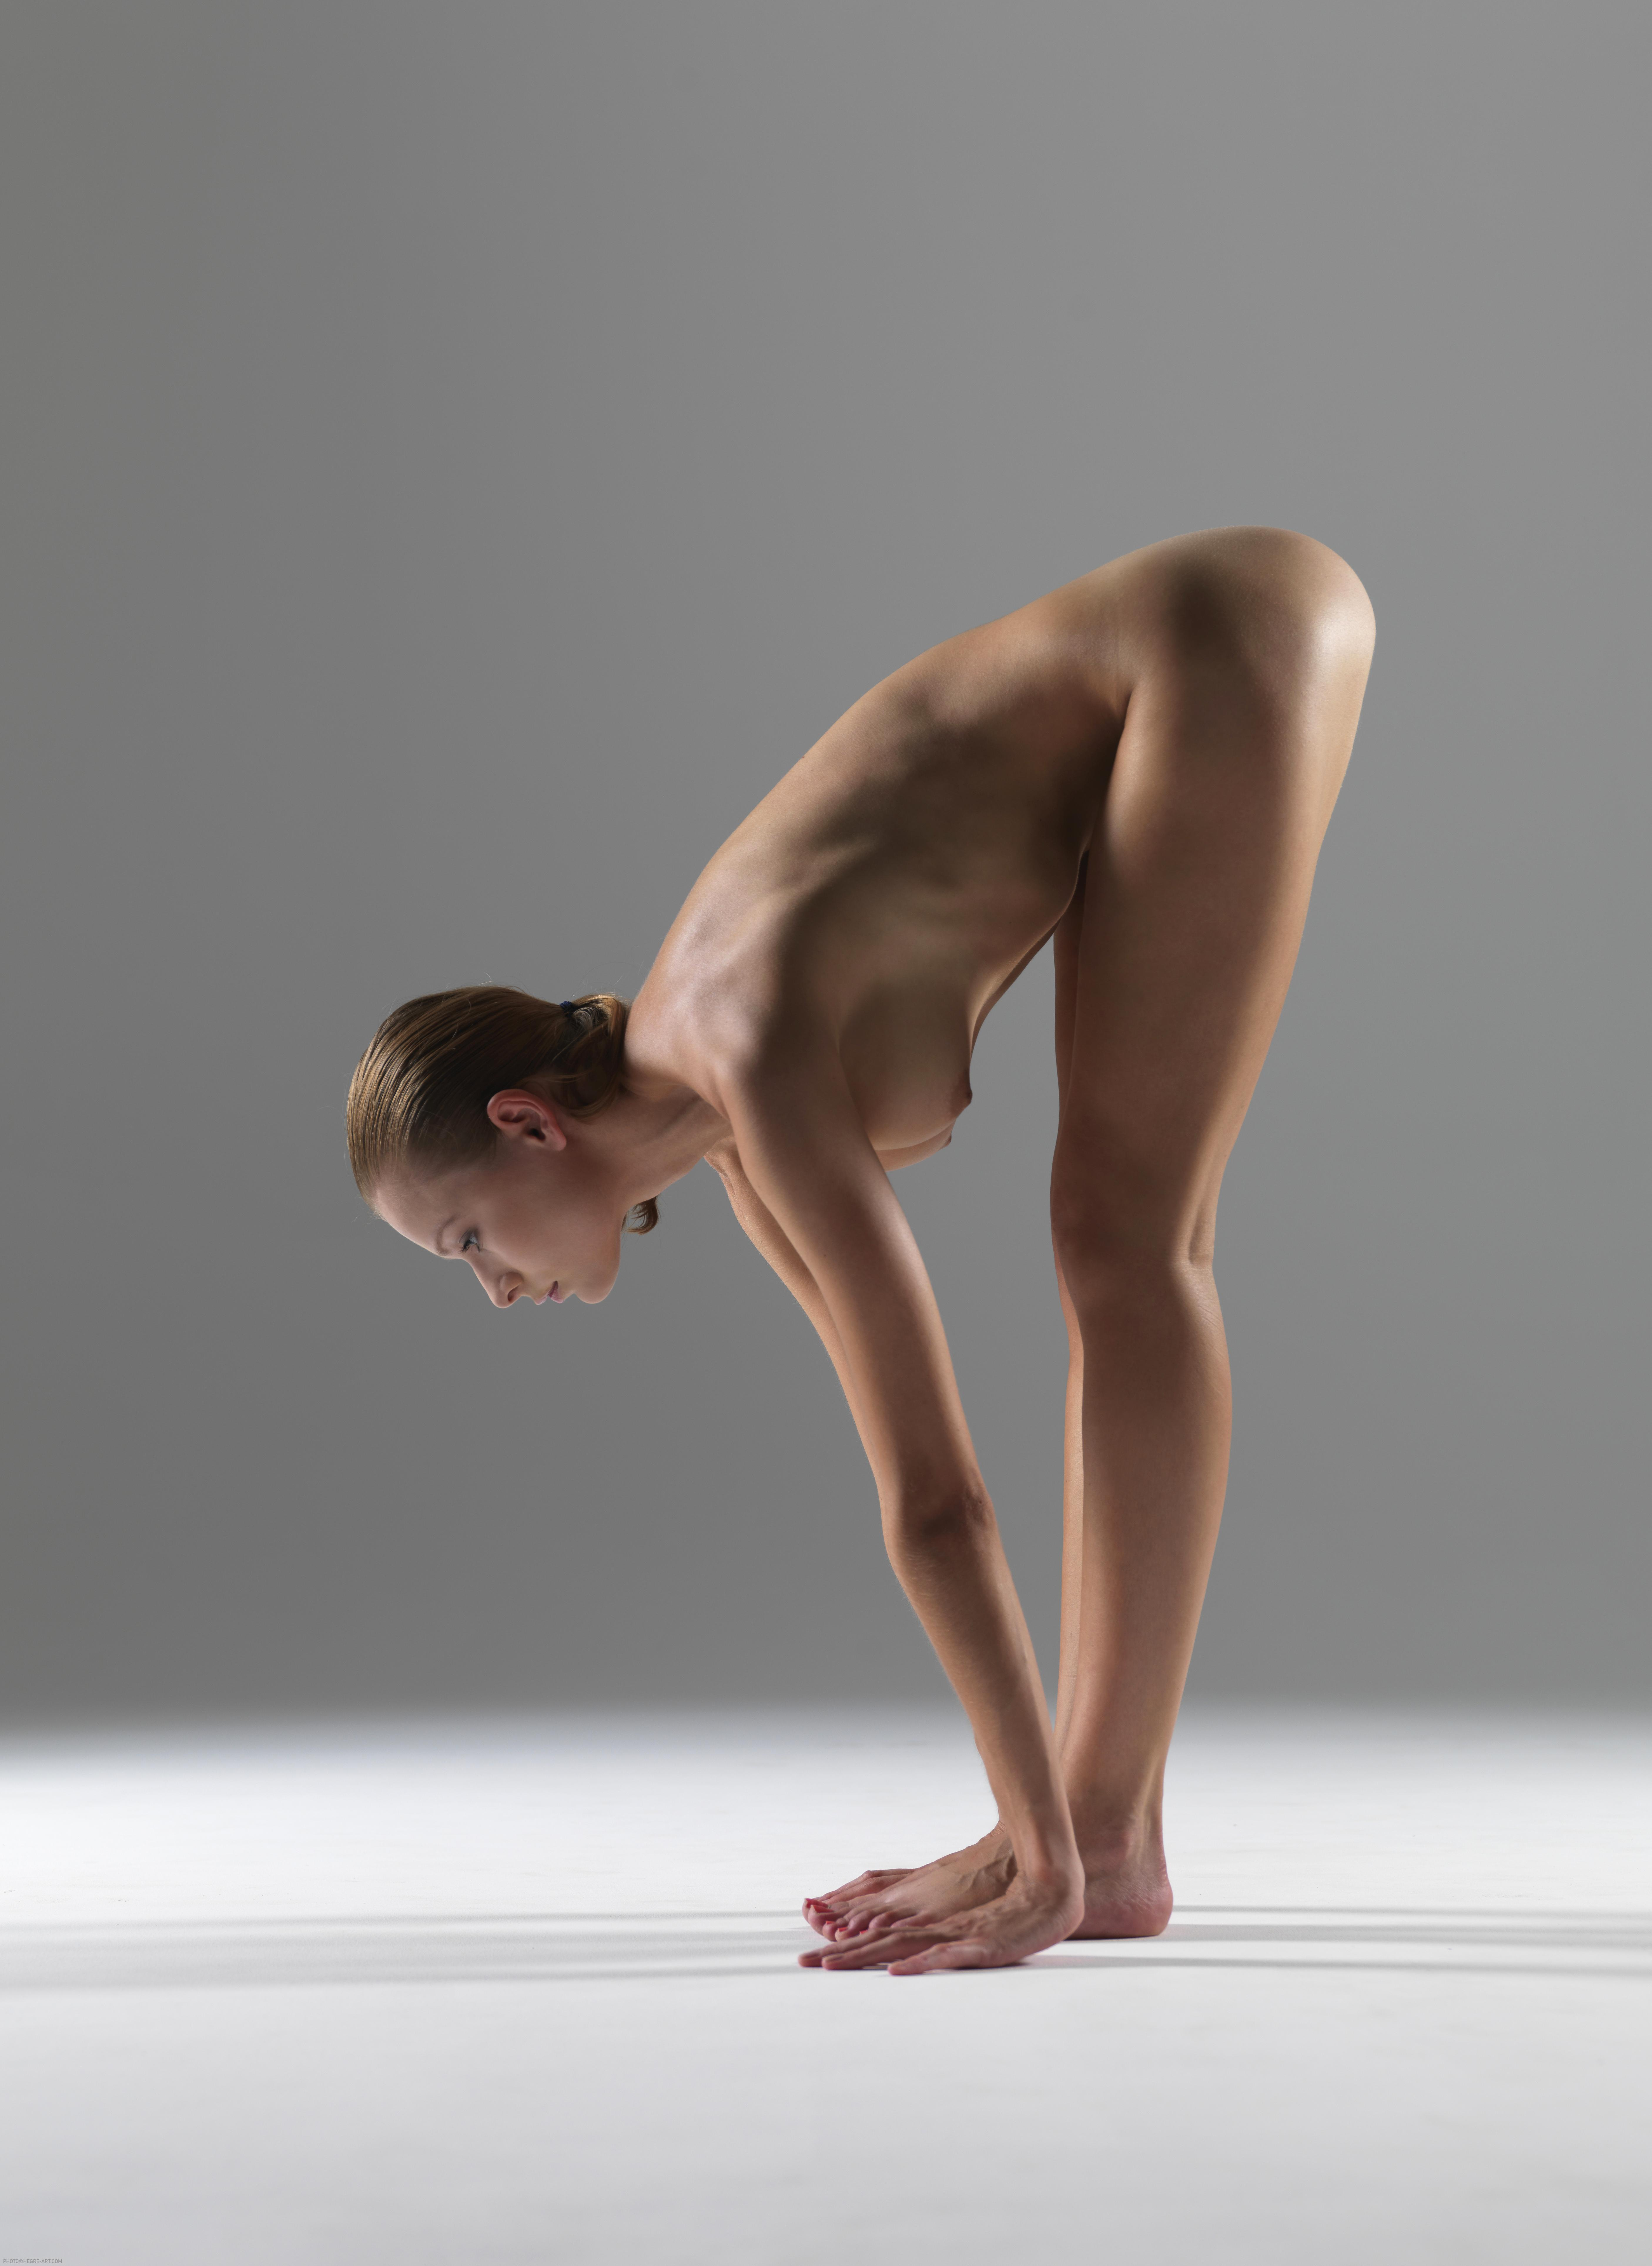 golaya-zhenshina-yog